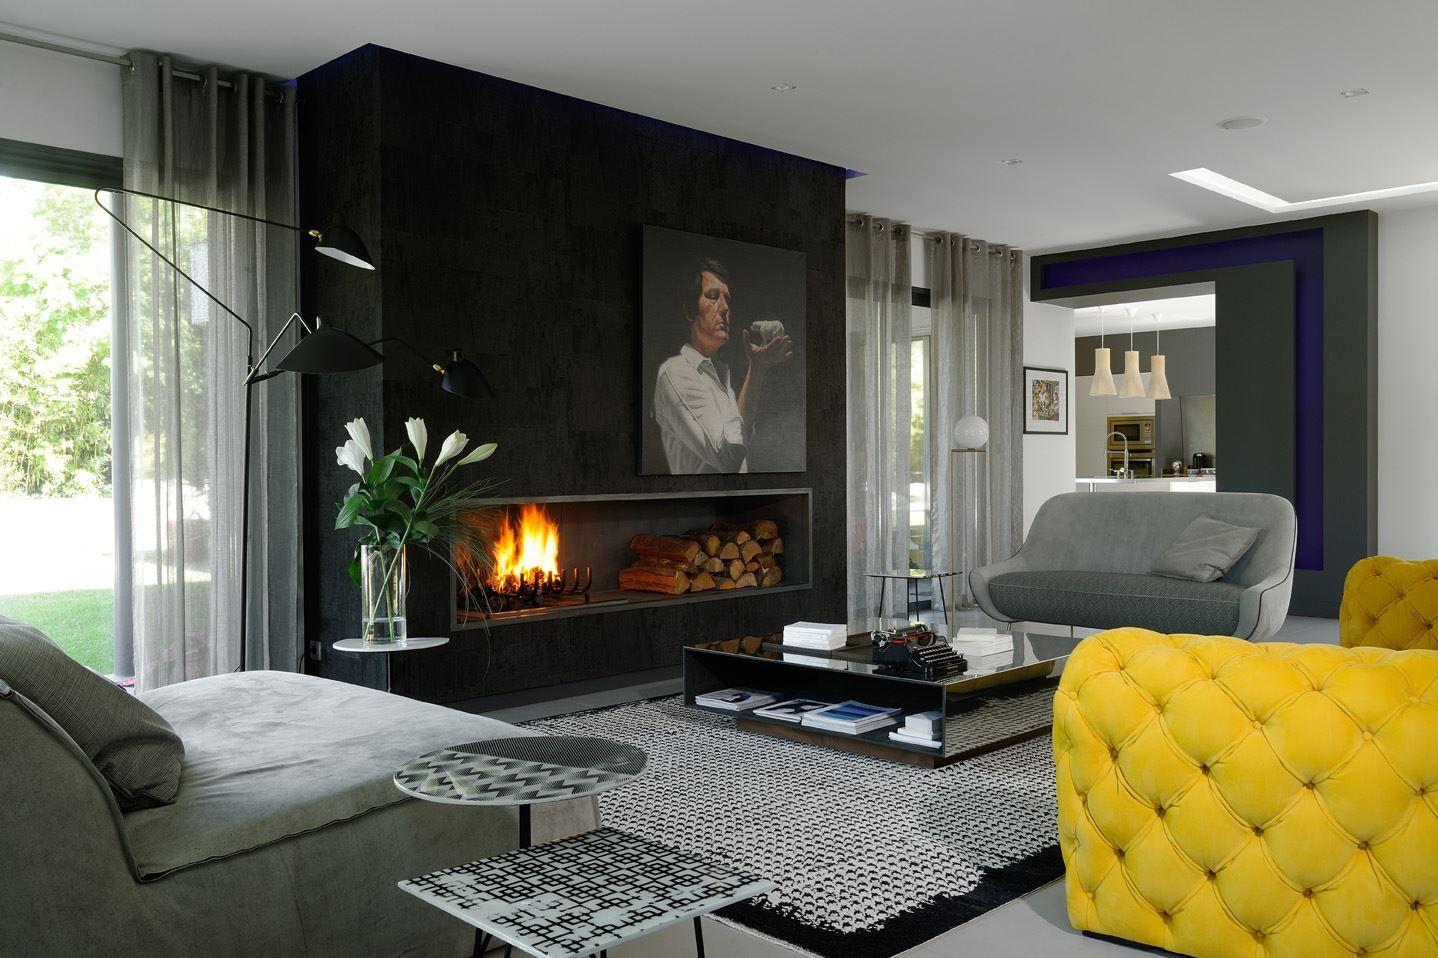 Maison Collonges - Picture gallery